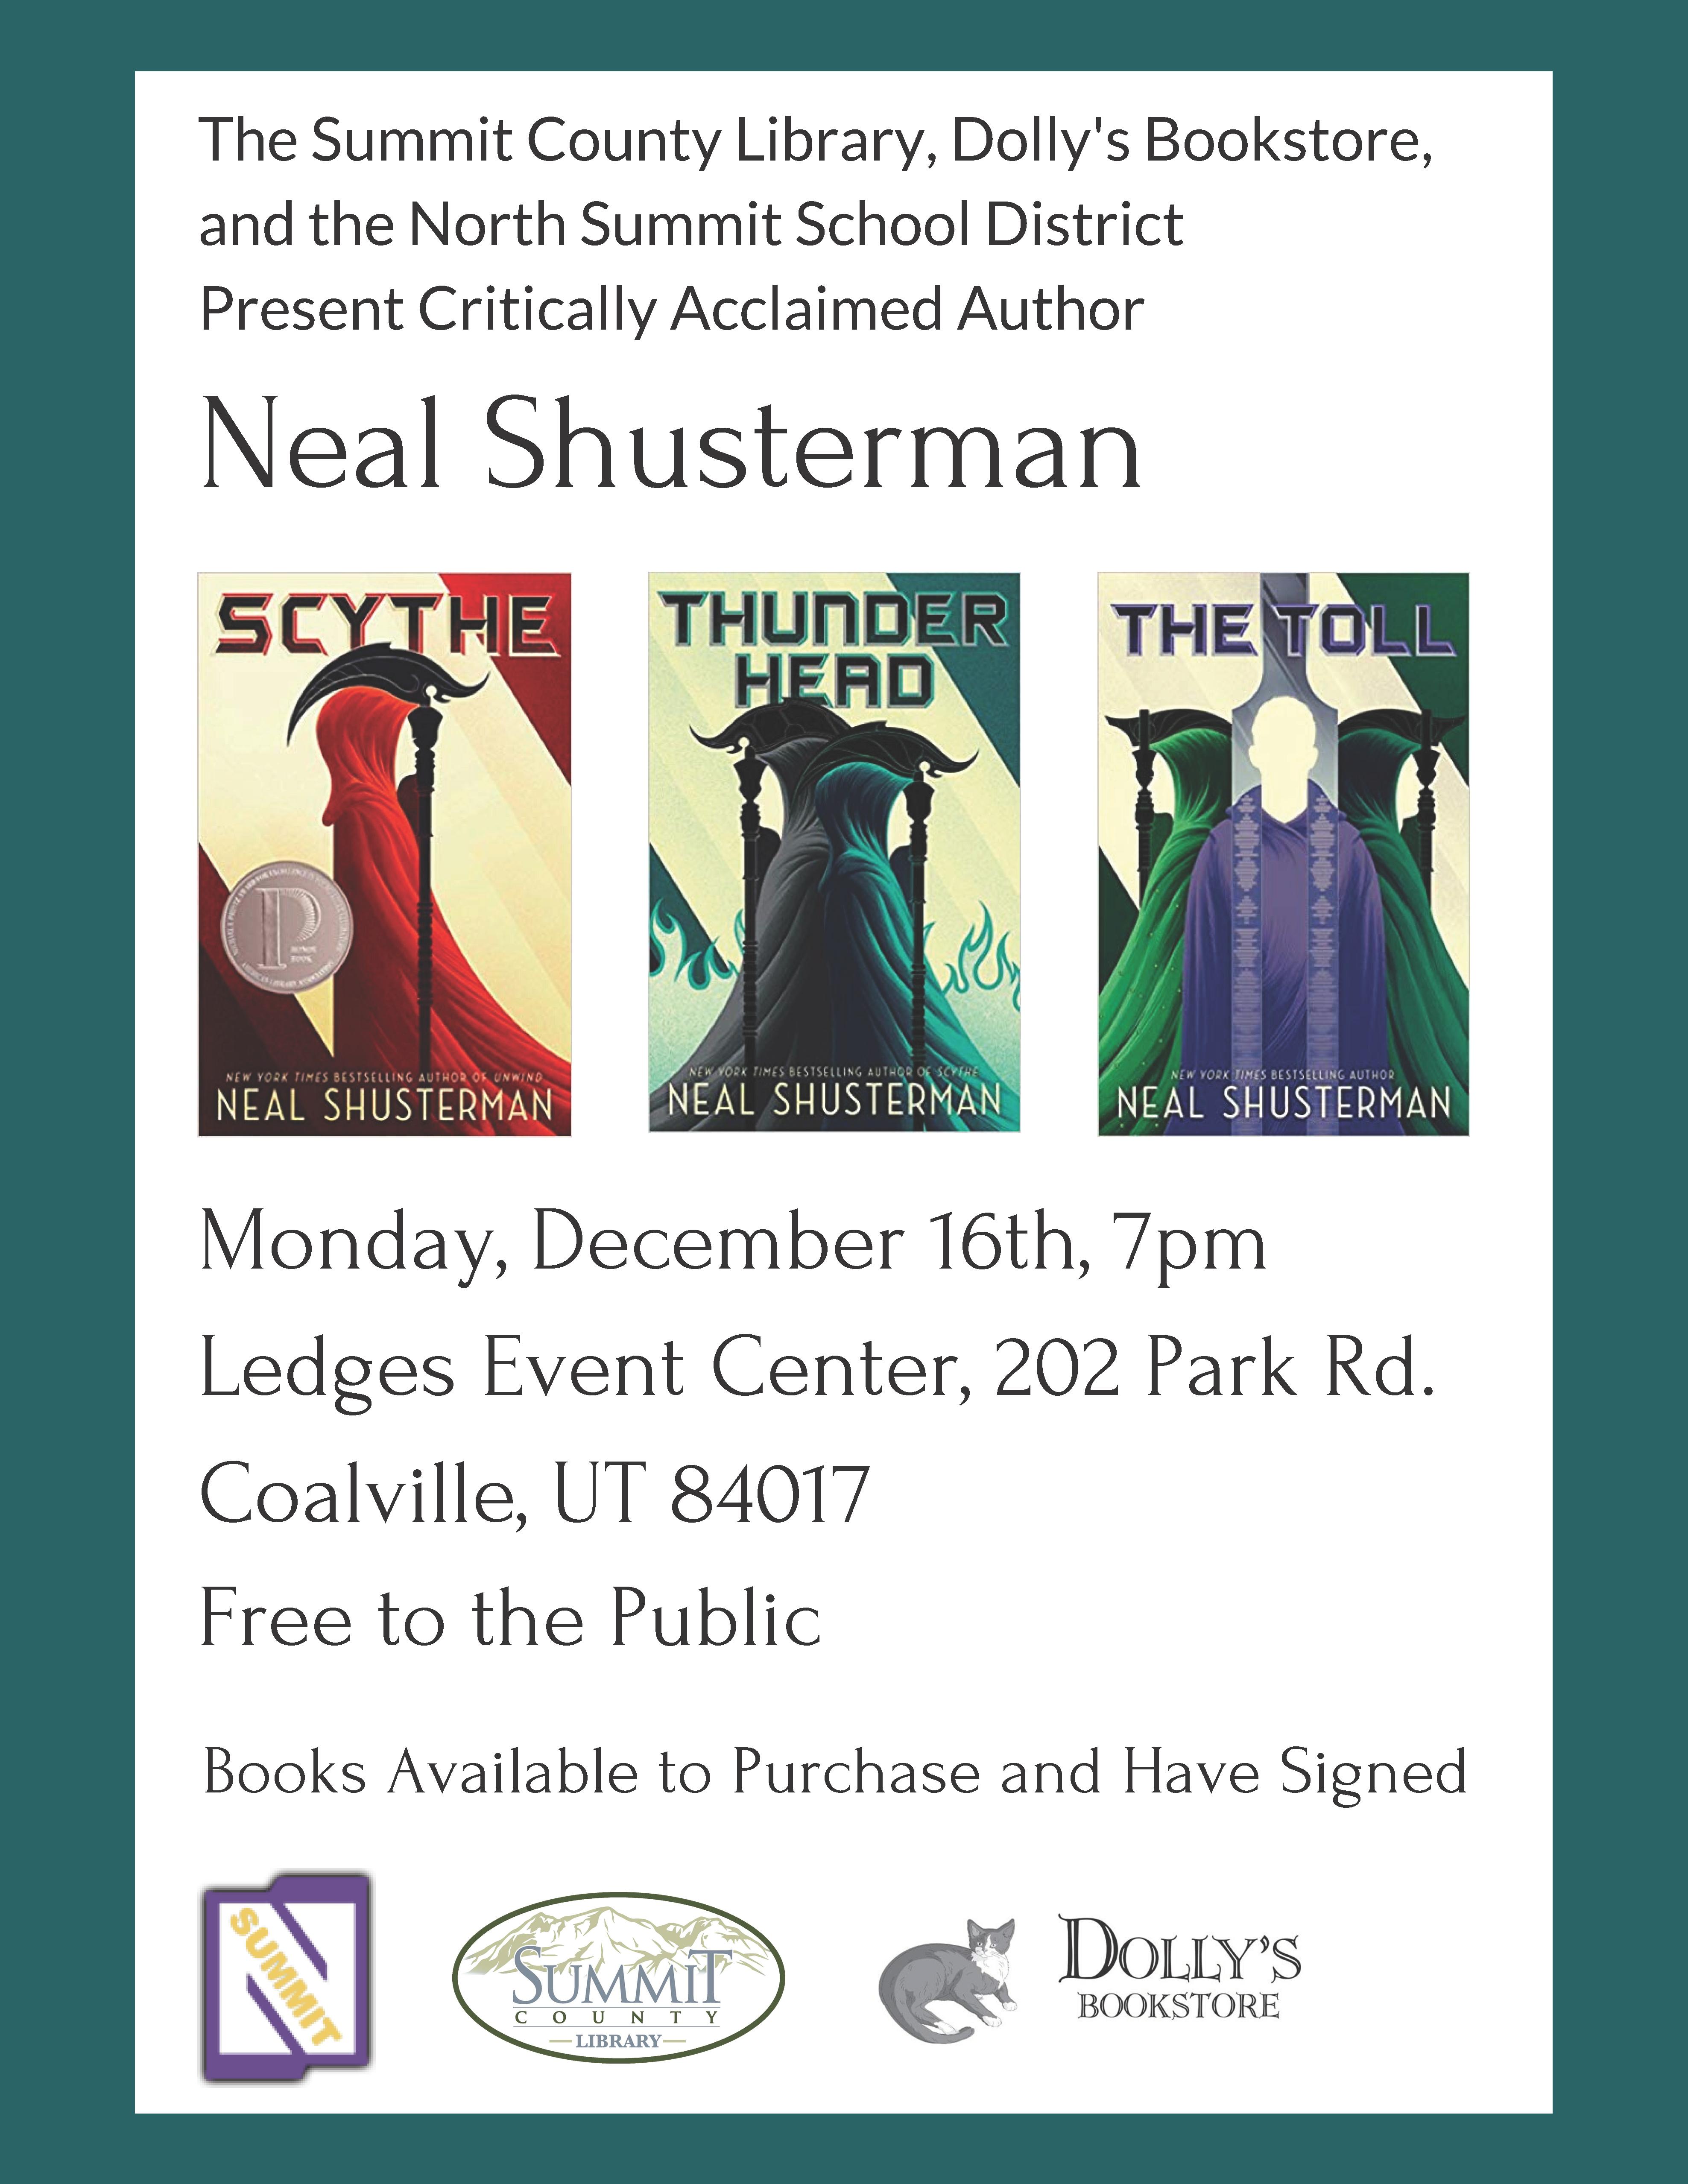 Neal Shusterman Event